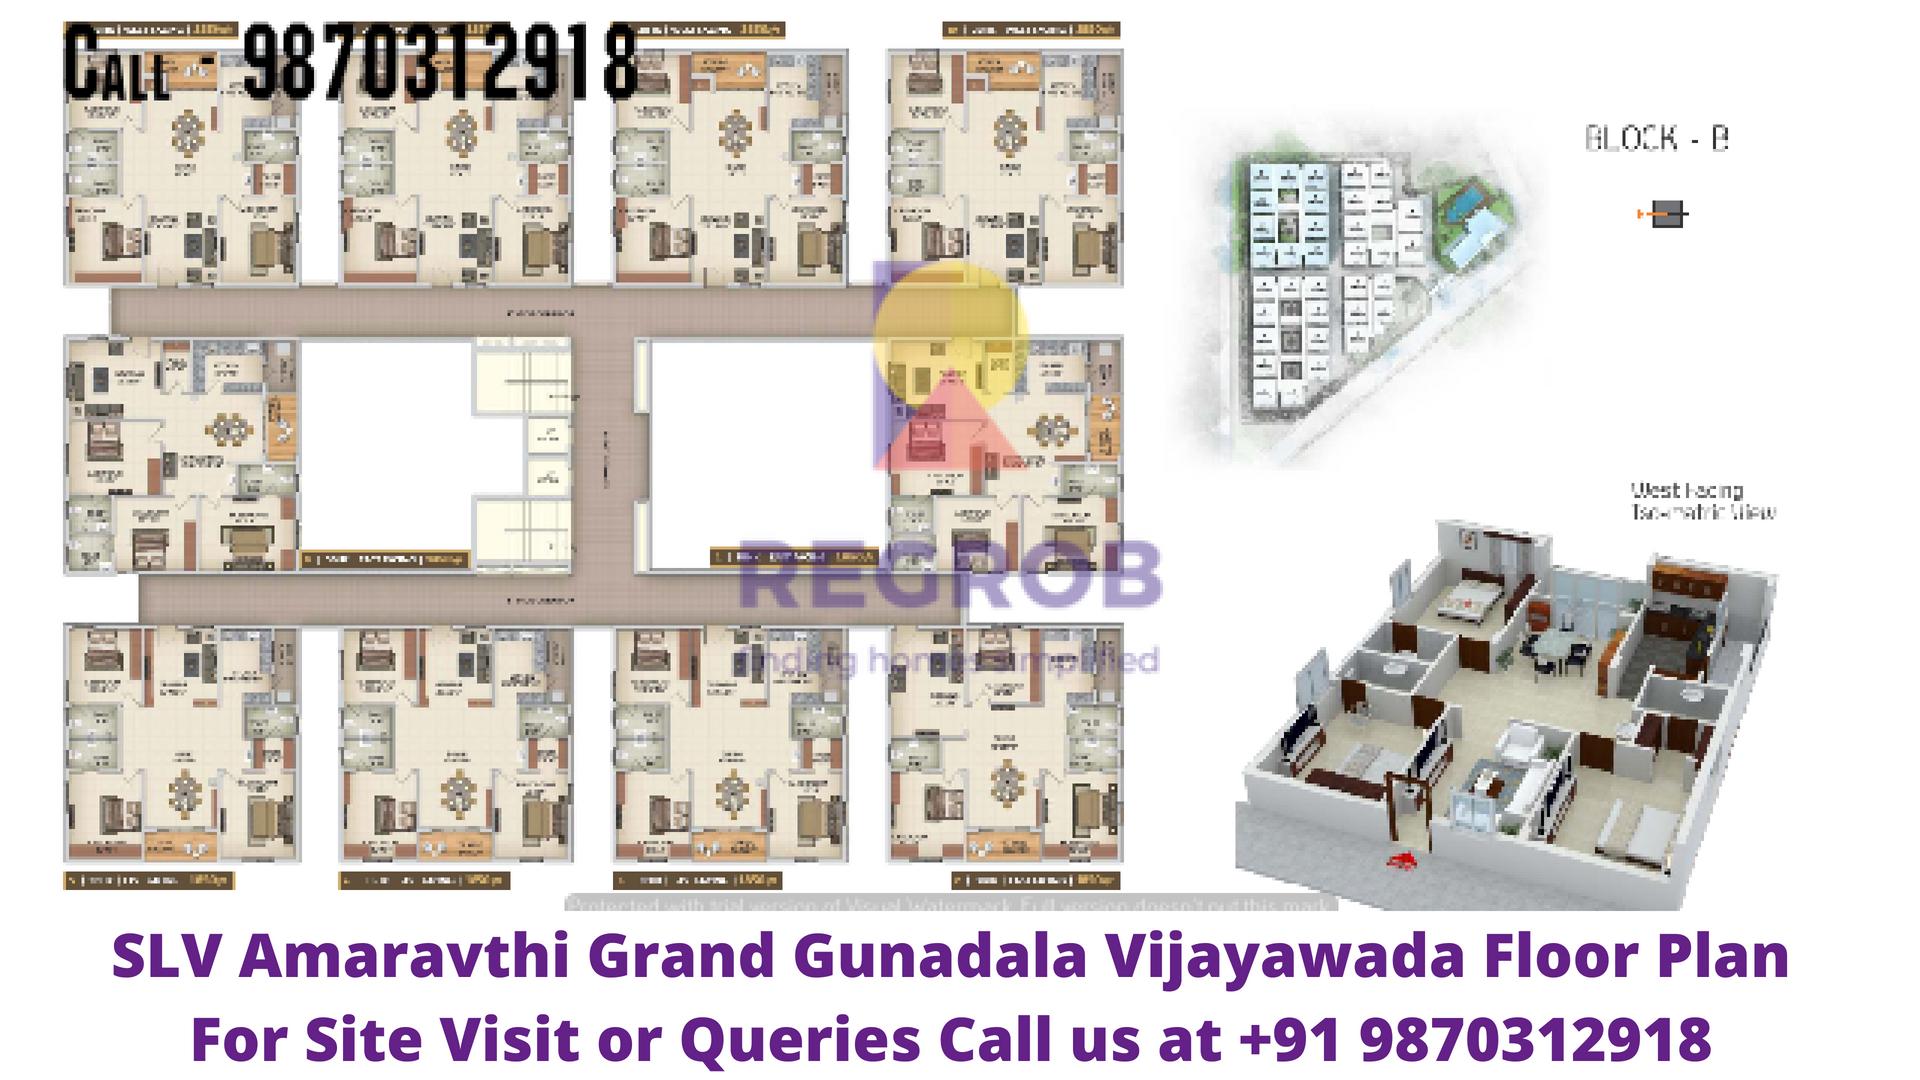 SLV Amaravathi Grand Gunadala Vijayawada